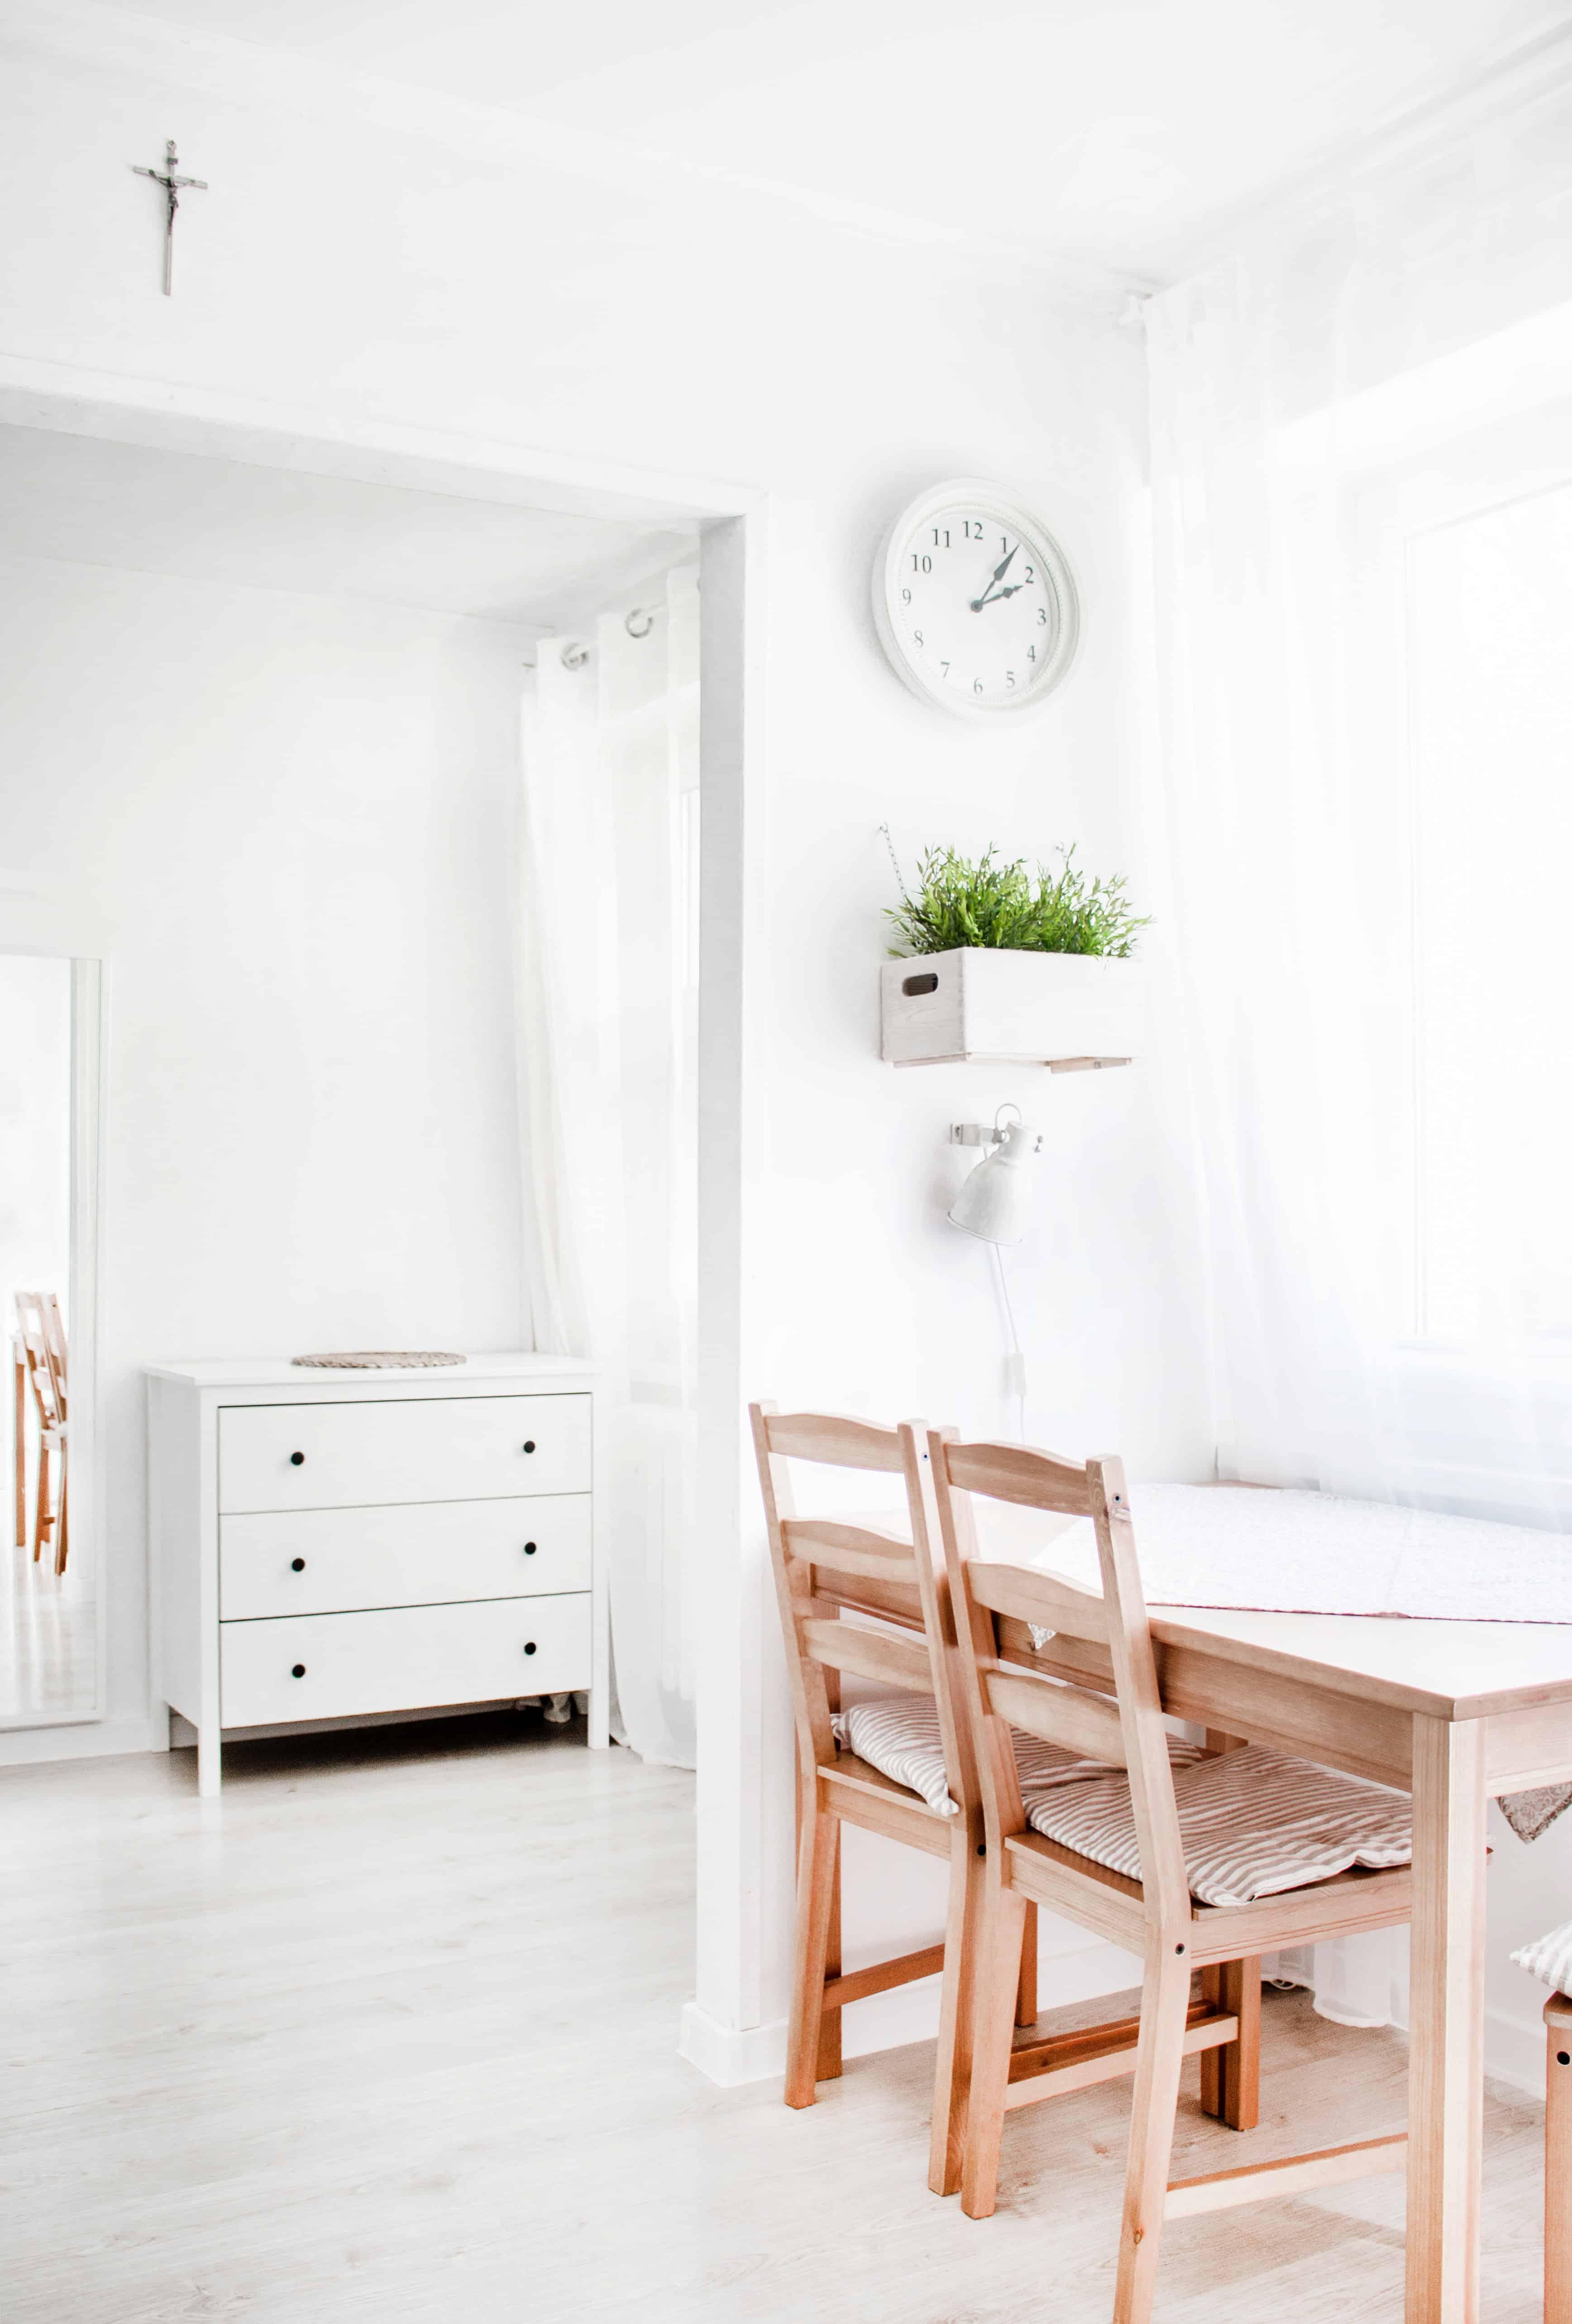 living decorat in stil scandinav, in tonuri de alb si maro, foarte luminat